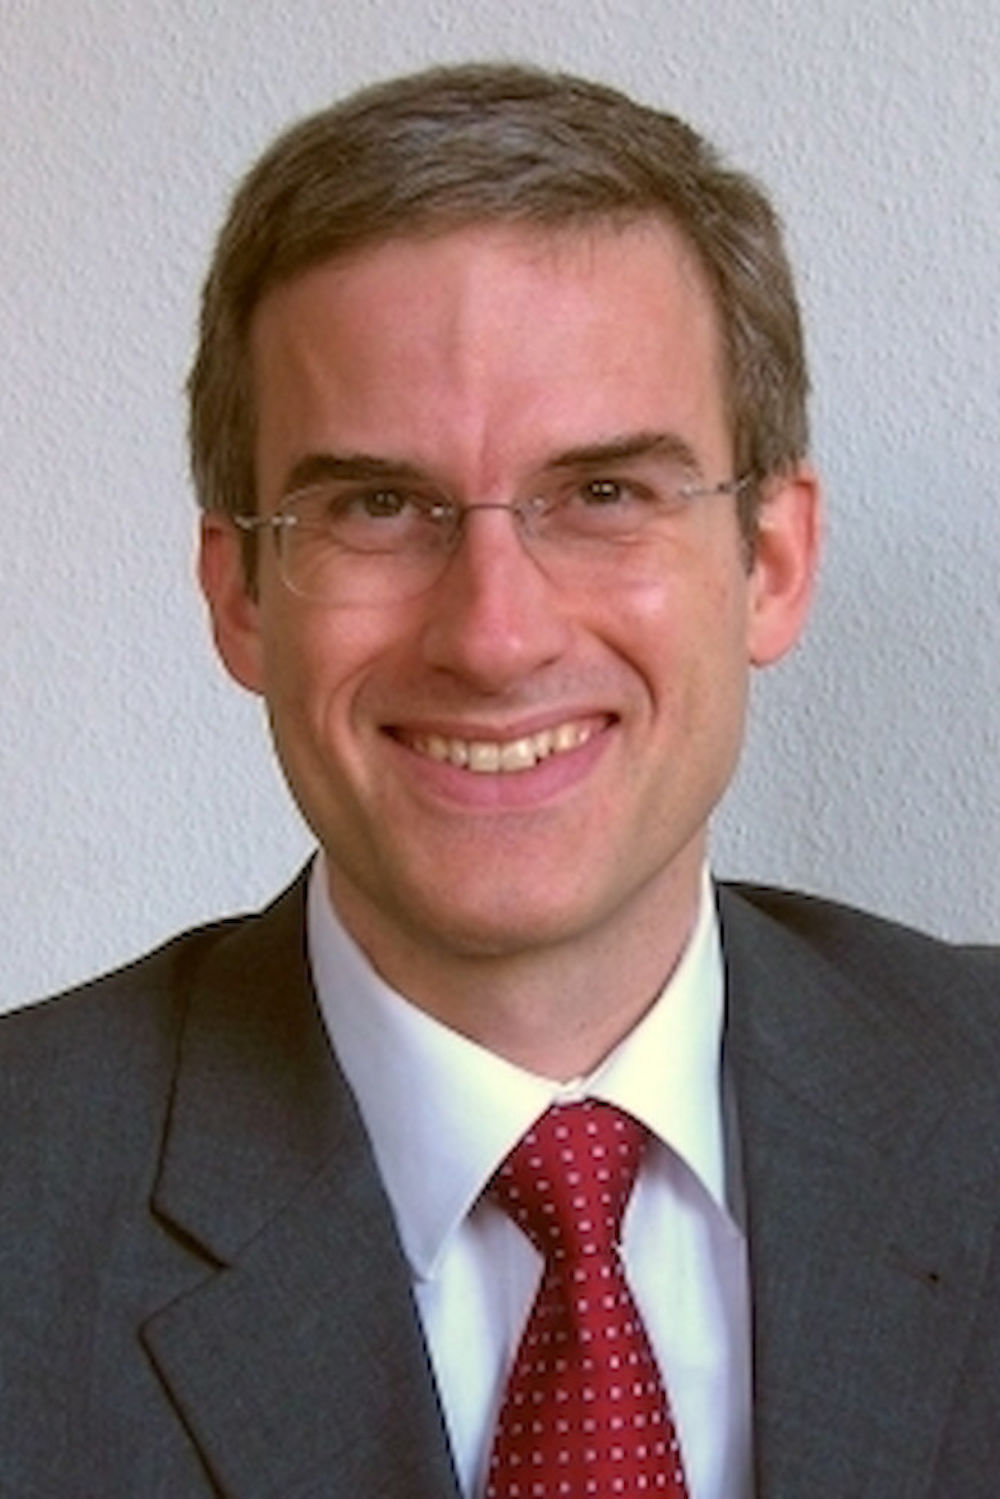 Michael Germann